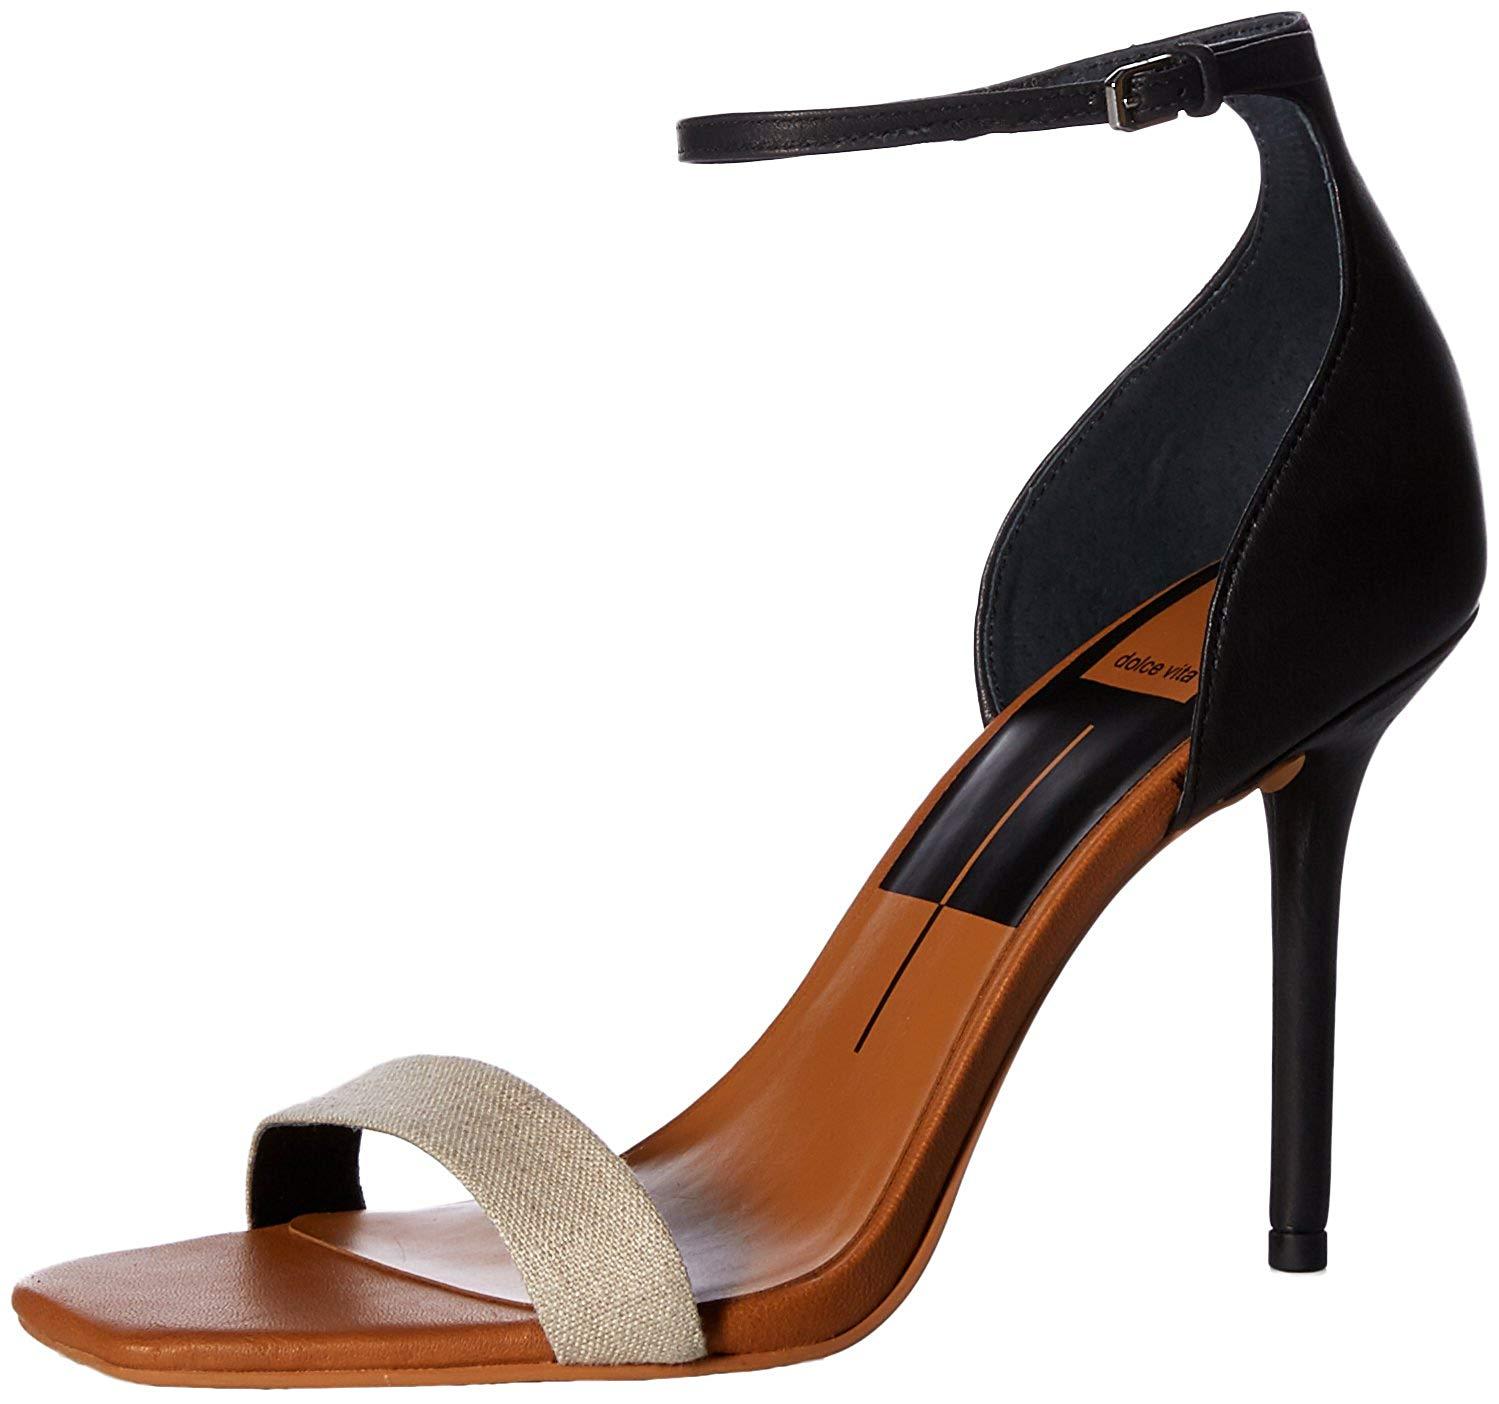 f37ce7e9ece8 Details about Dolce Vita Women s Halo Heeled Sandal